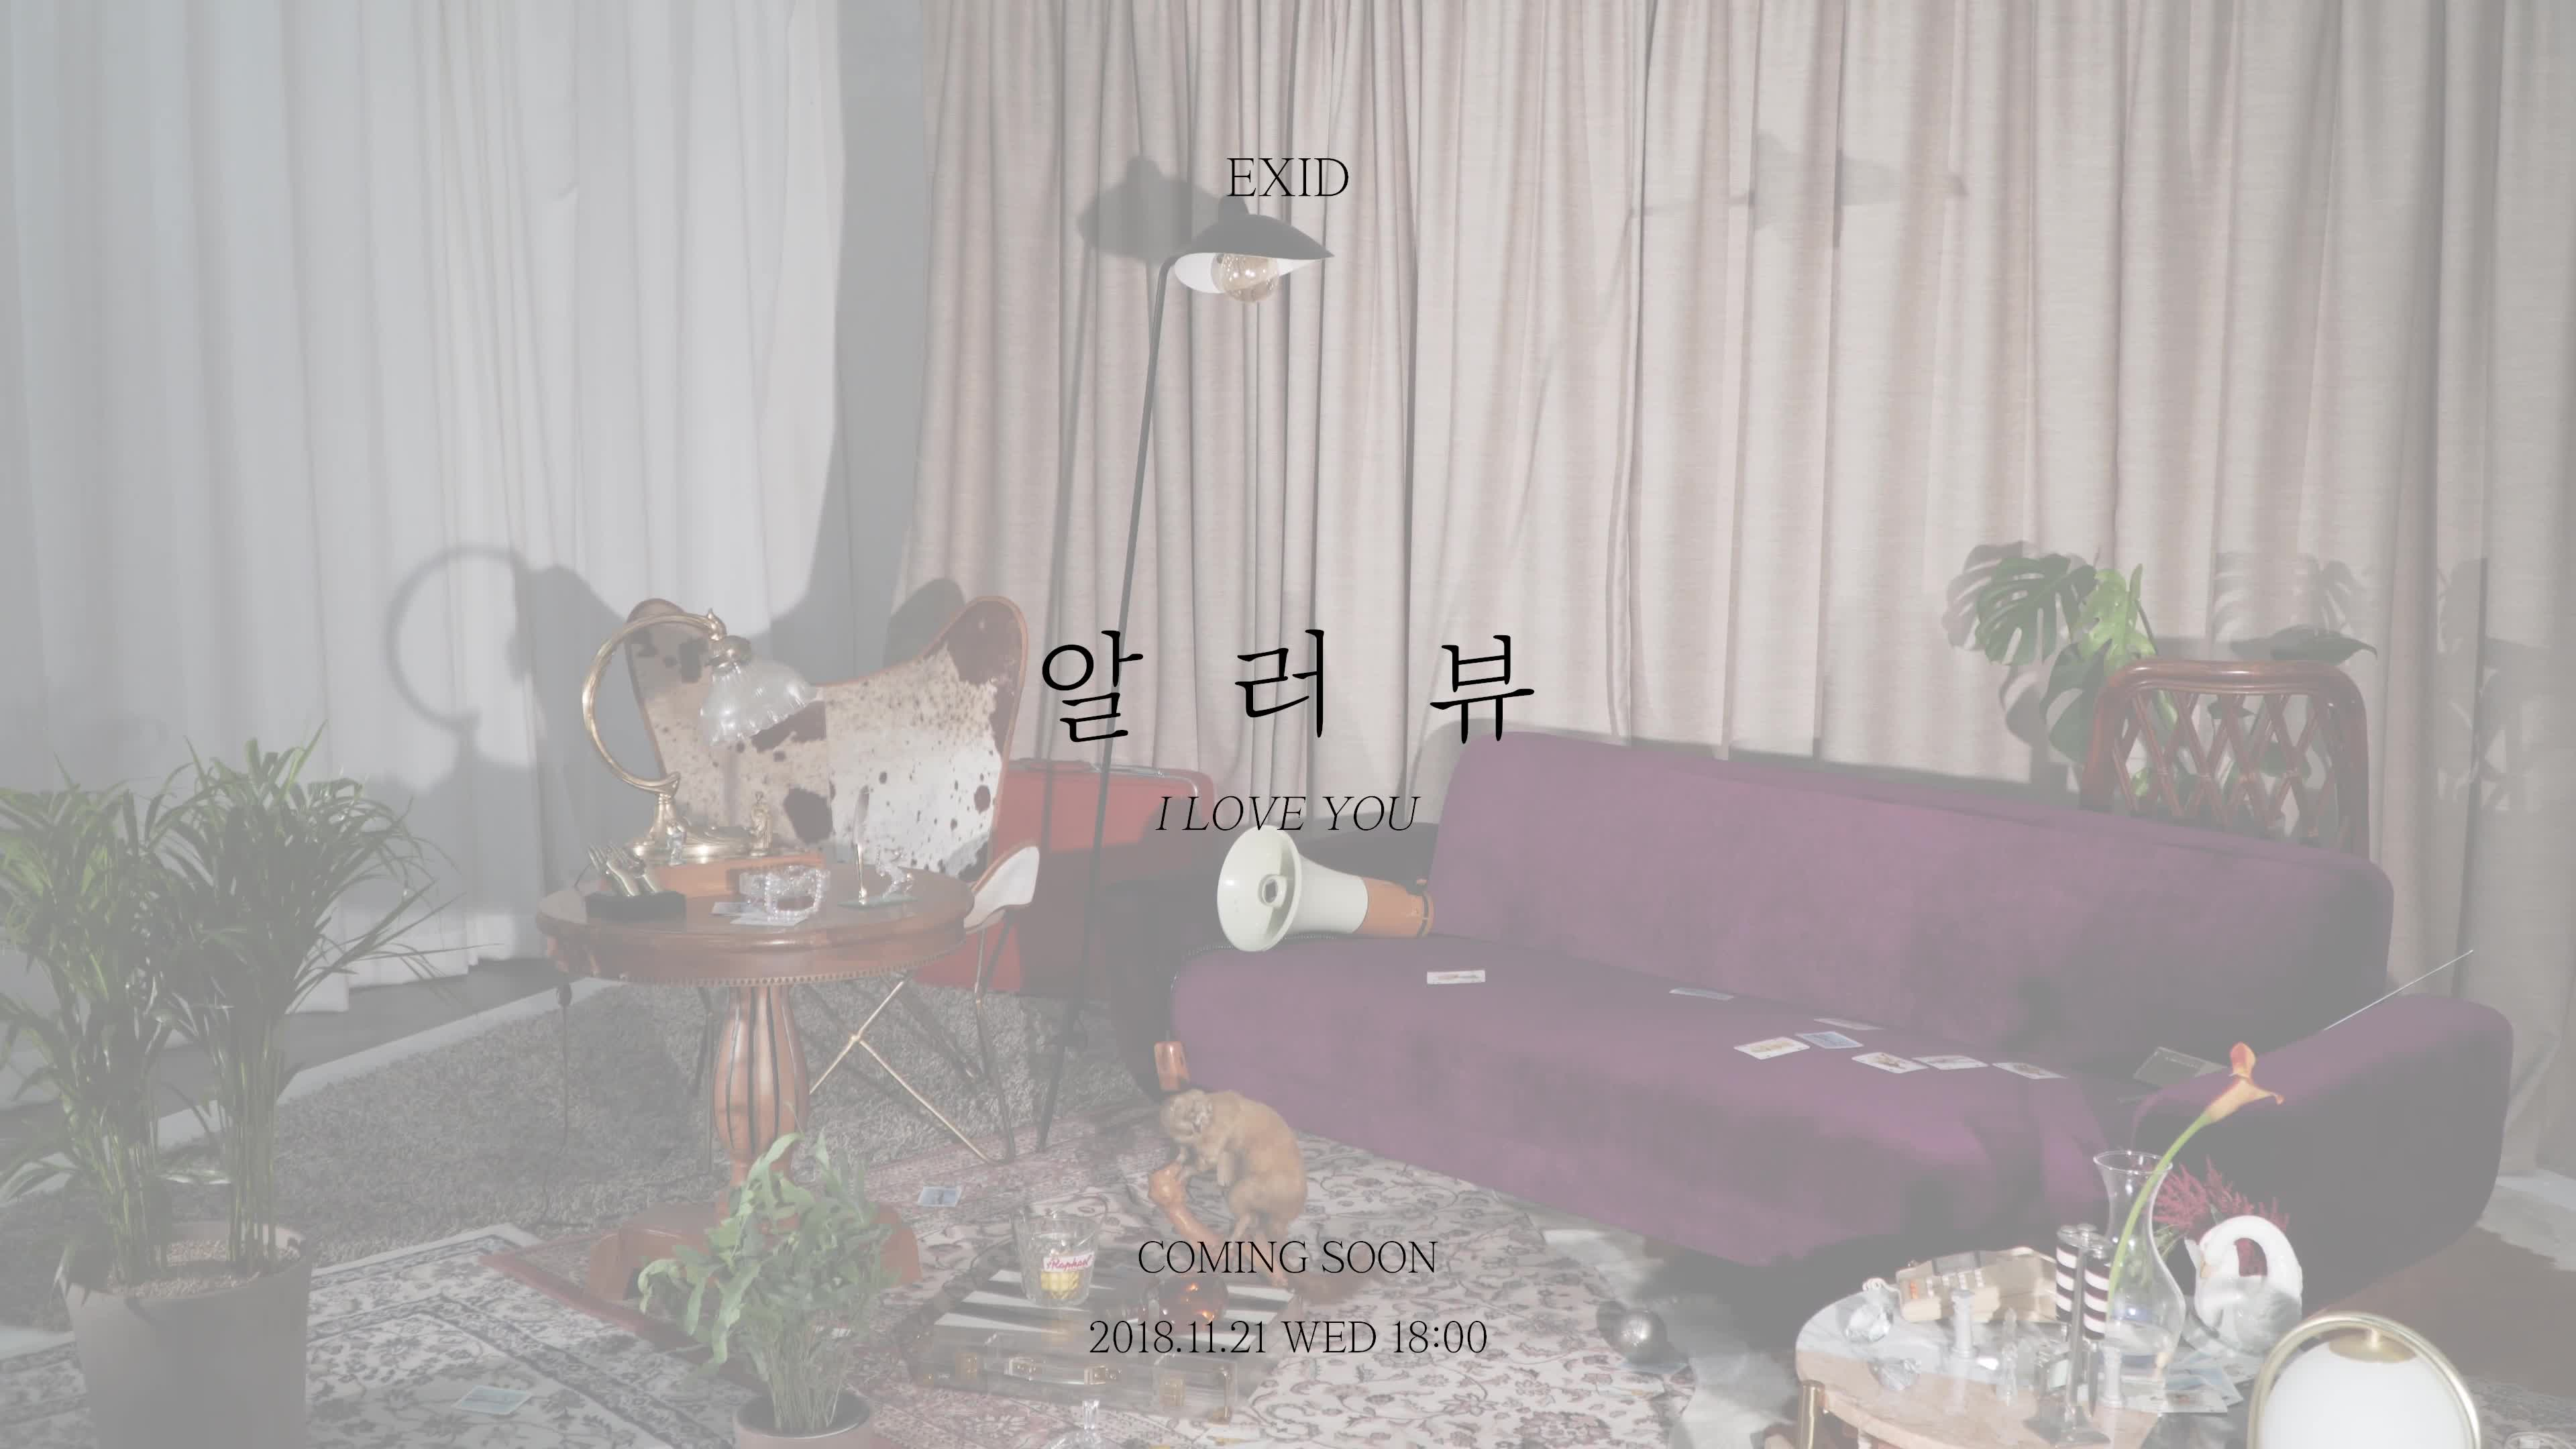 [EXID(이엑스아이디)] '알러뷰' 컴백 인터뷰 #5. SOL JI ('I LOVE YOU' Comeback Interview #5. SOL JI)